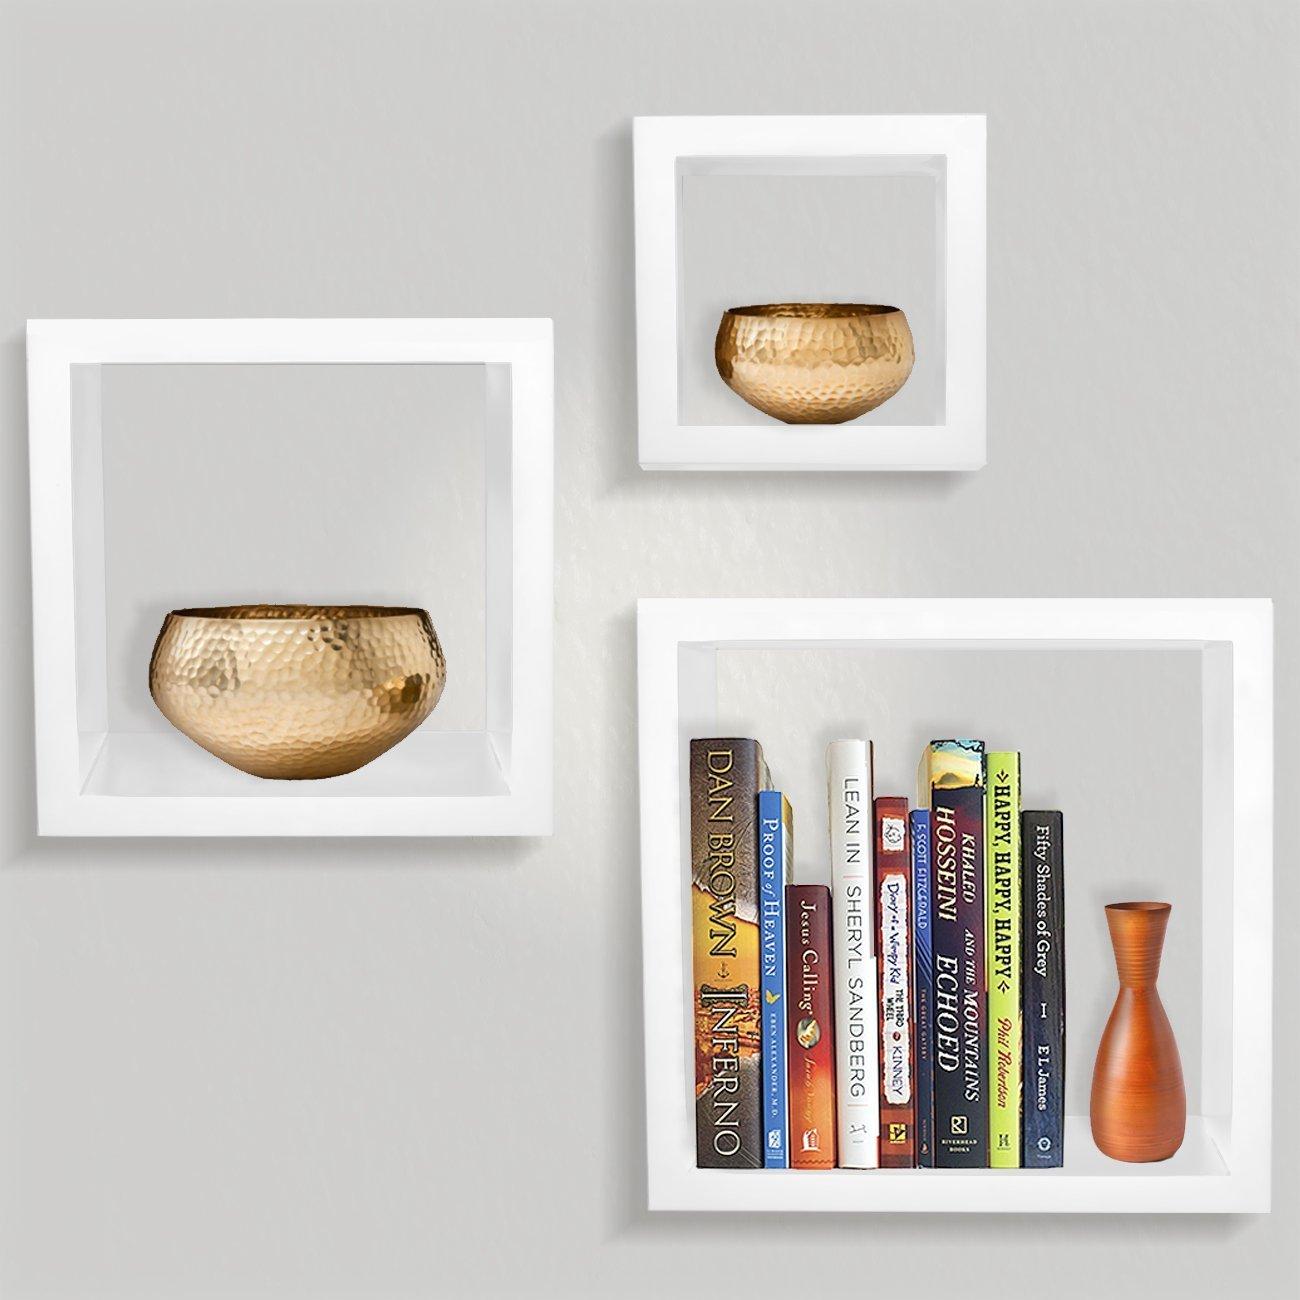 Sorbus WD-SQR-WH Square Decor Shelves, Set of 3, Matte White GGI INTERNATIONAL